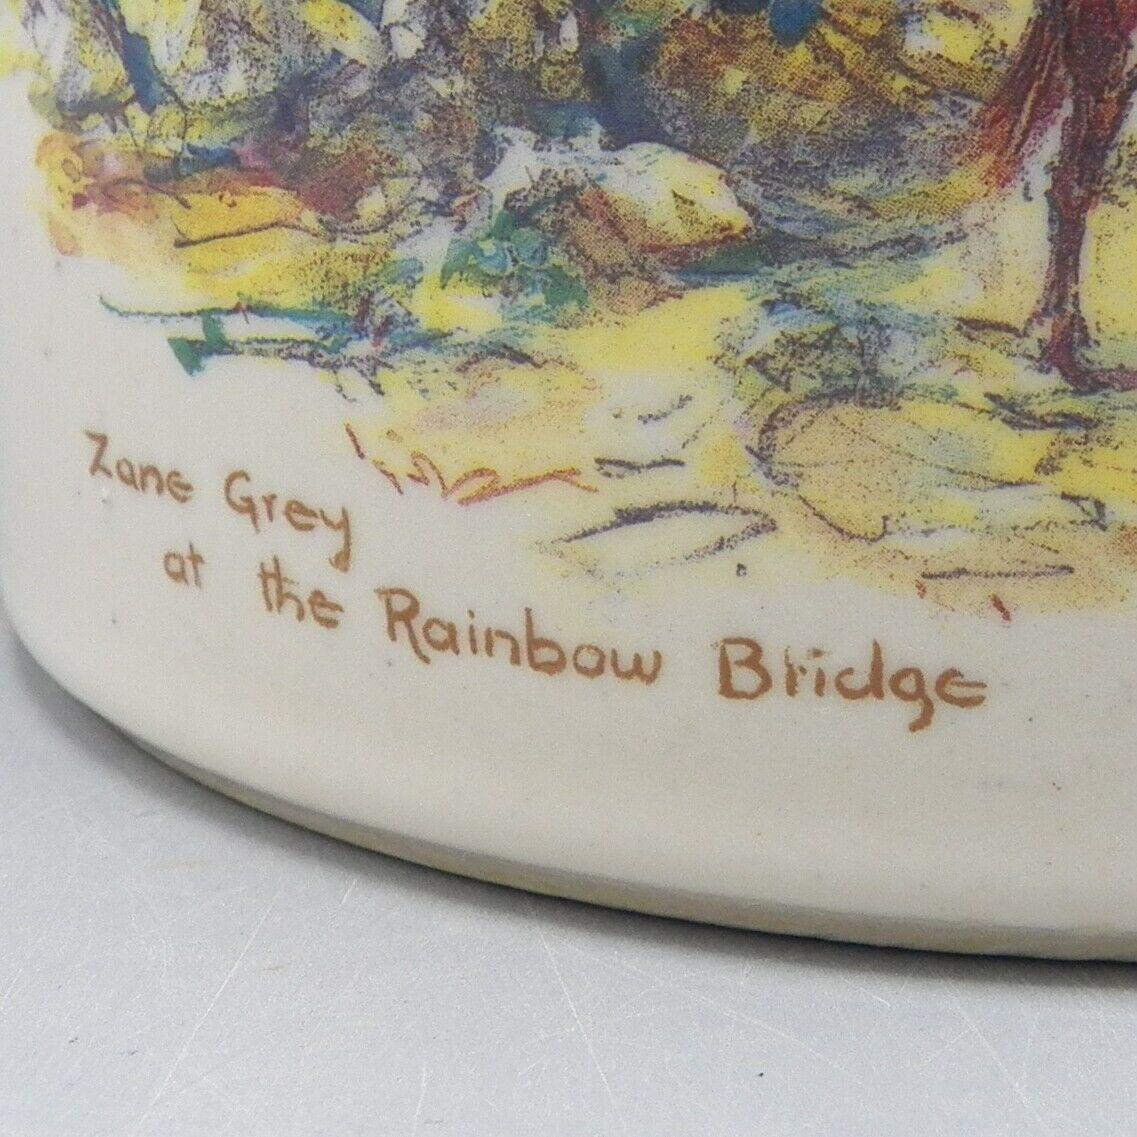 Zanesville Stoneware Zane Grey At Rainbow Bridge Leslie Cope Vase Pot Pottery image 3